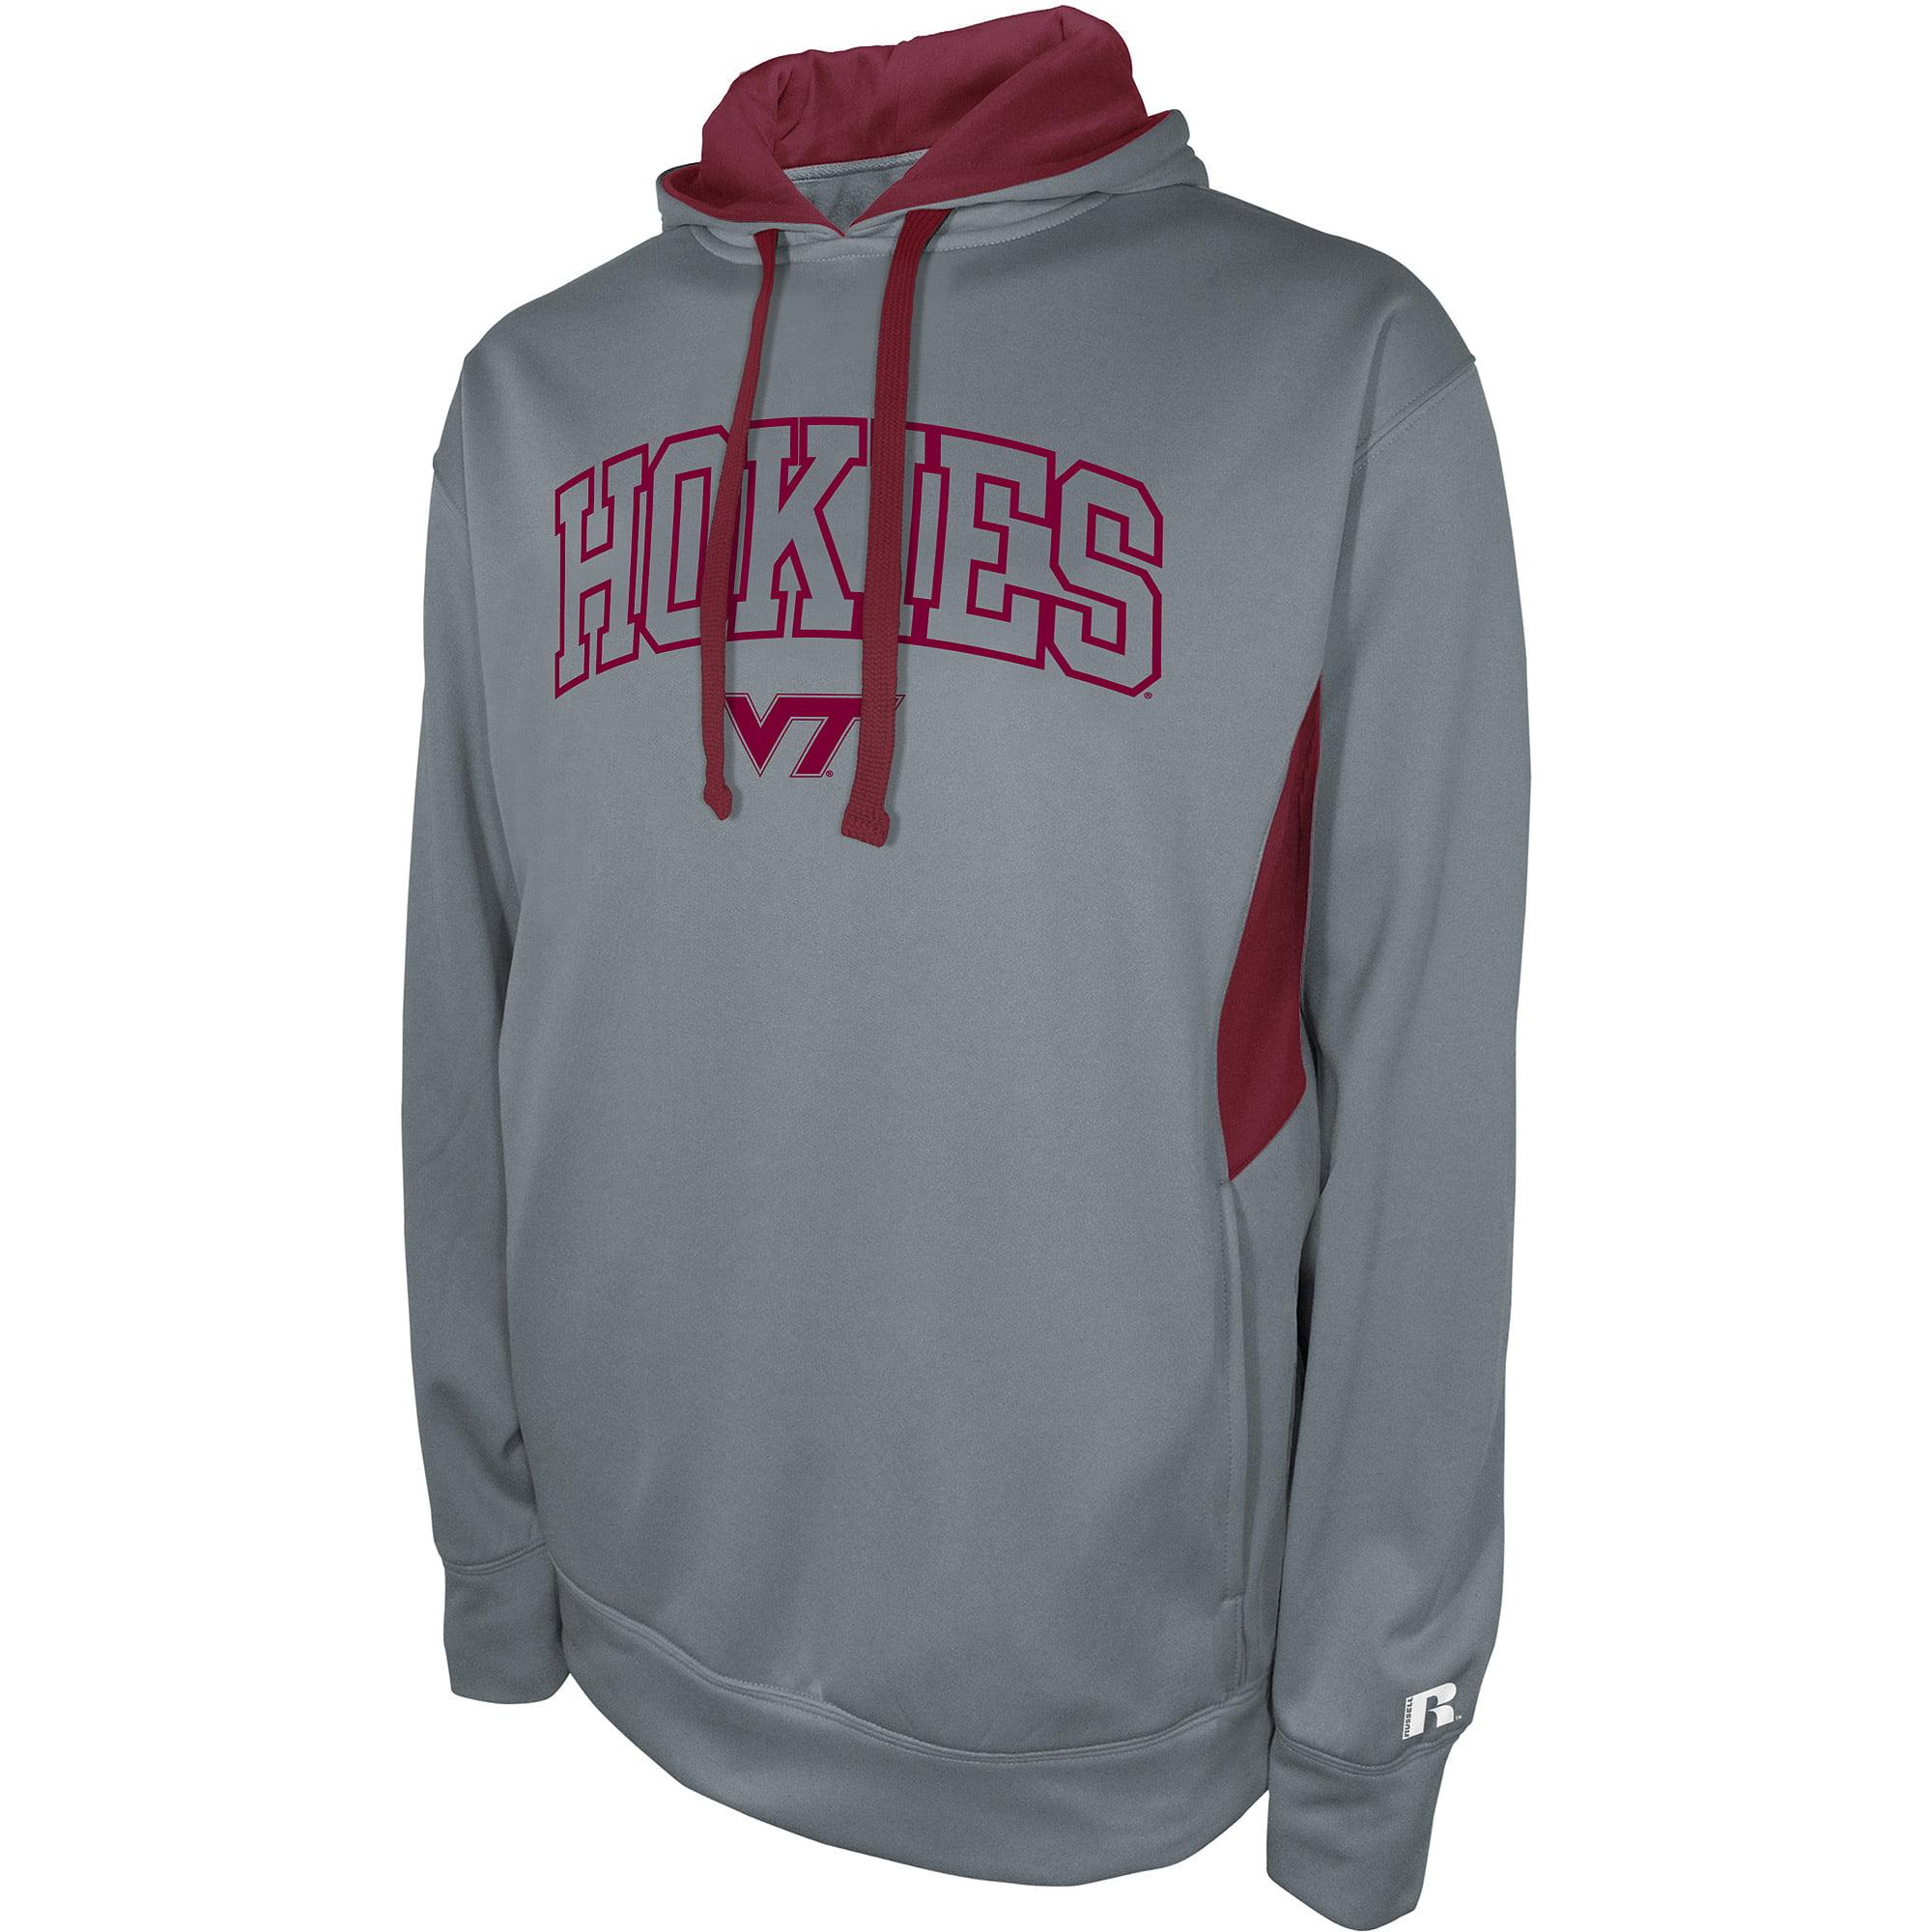 Russell NCAA Virginia Tech Hokies, Men's Pullover